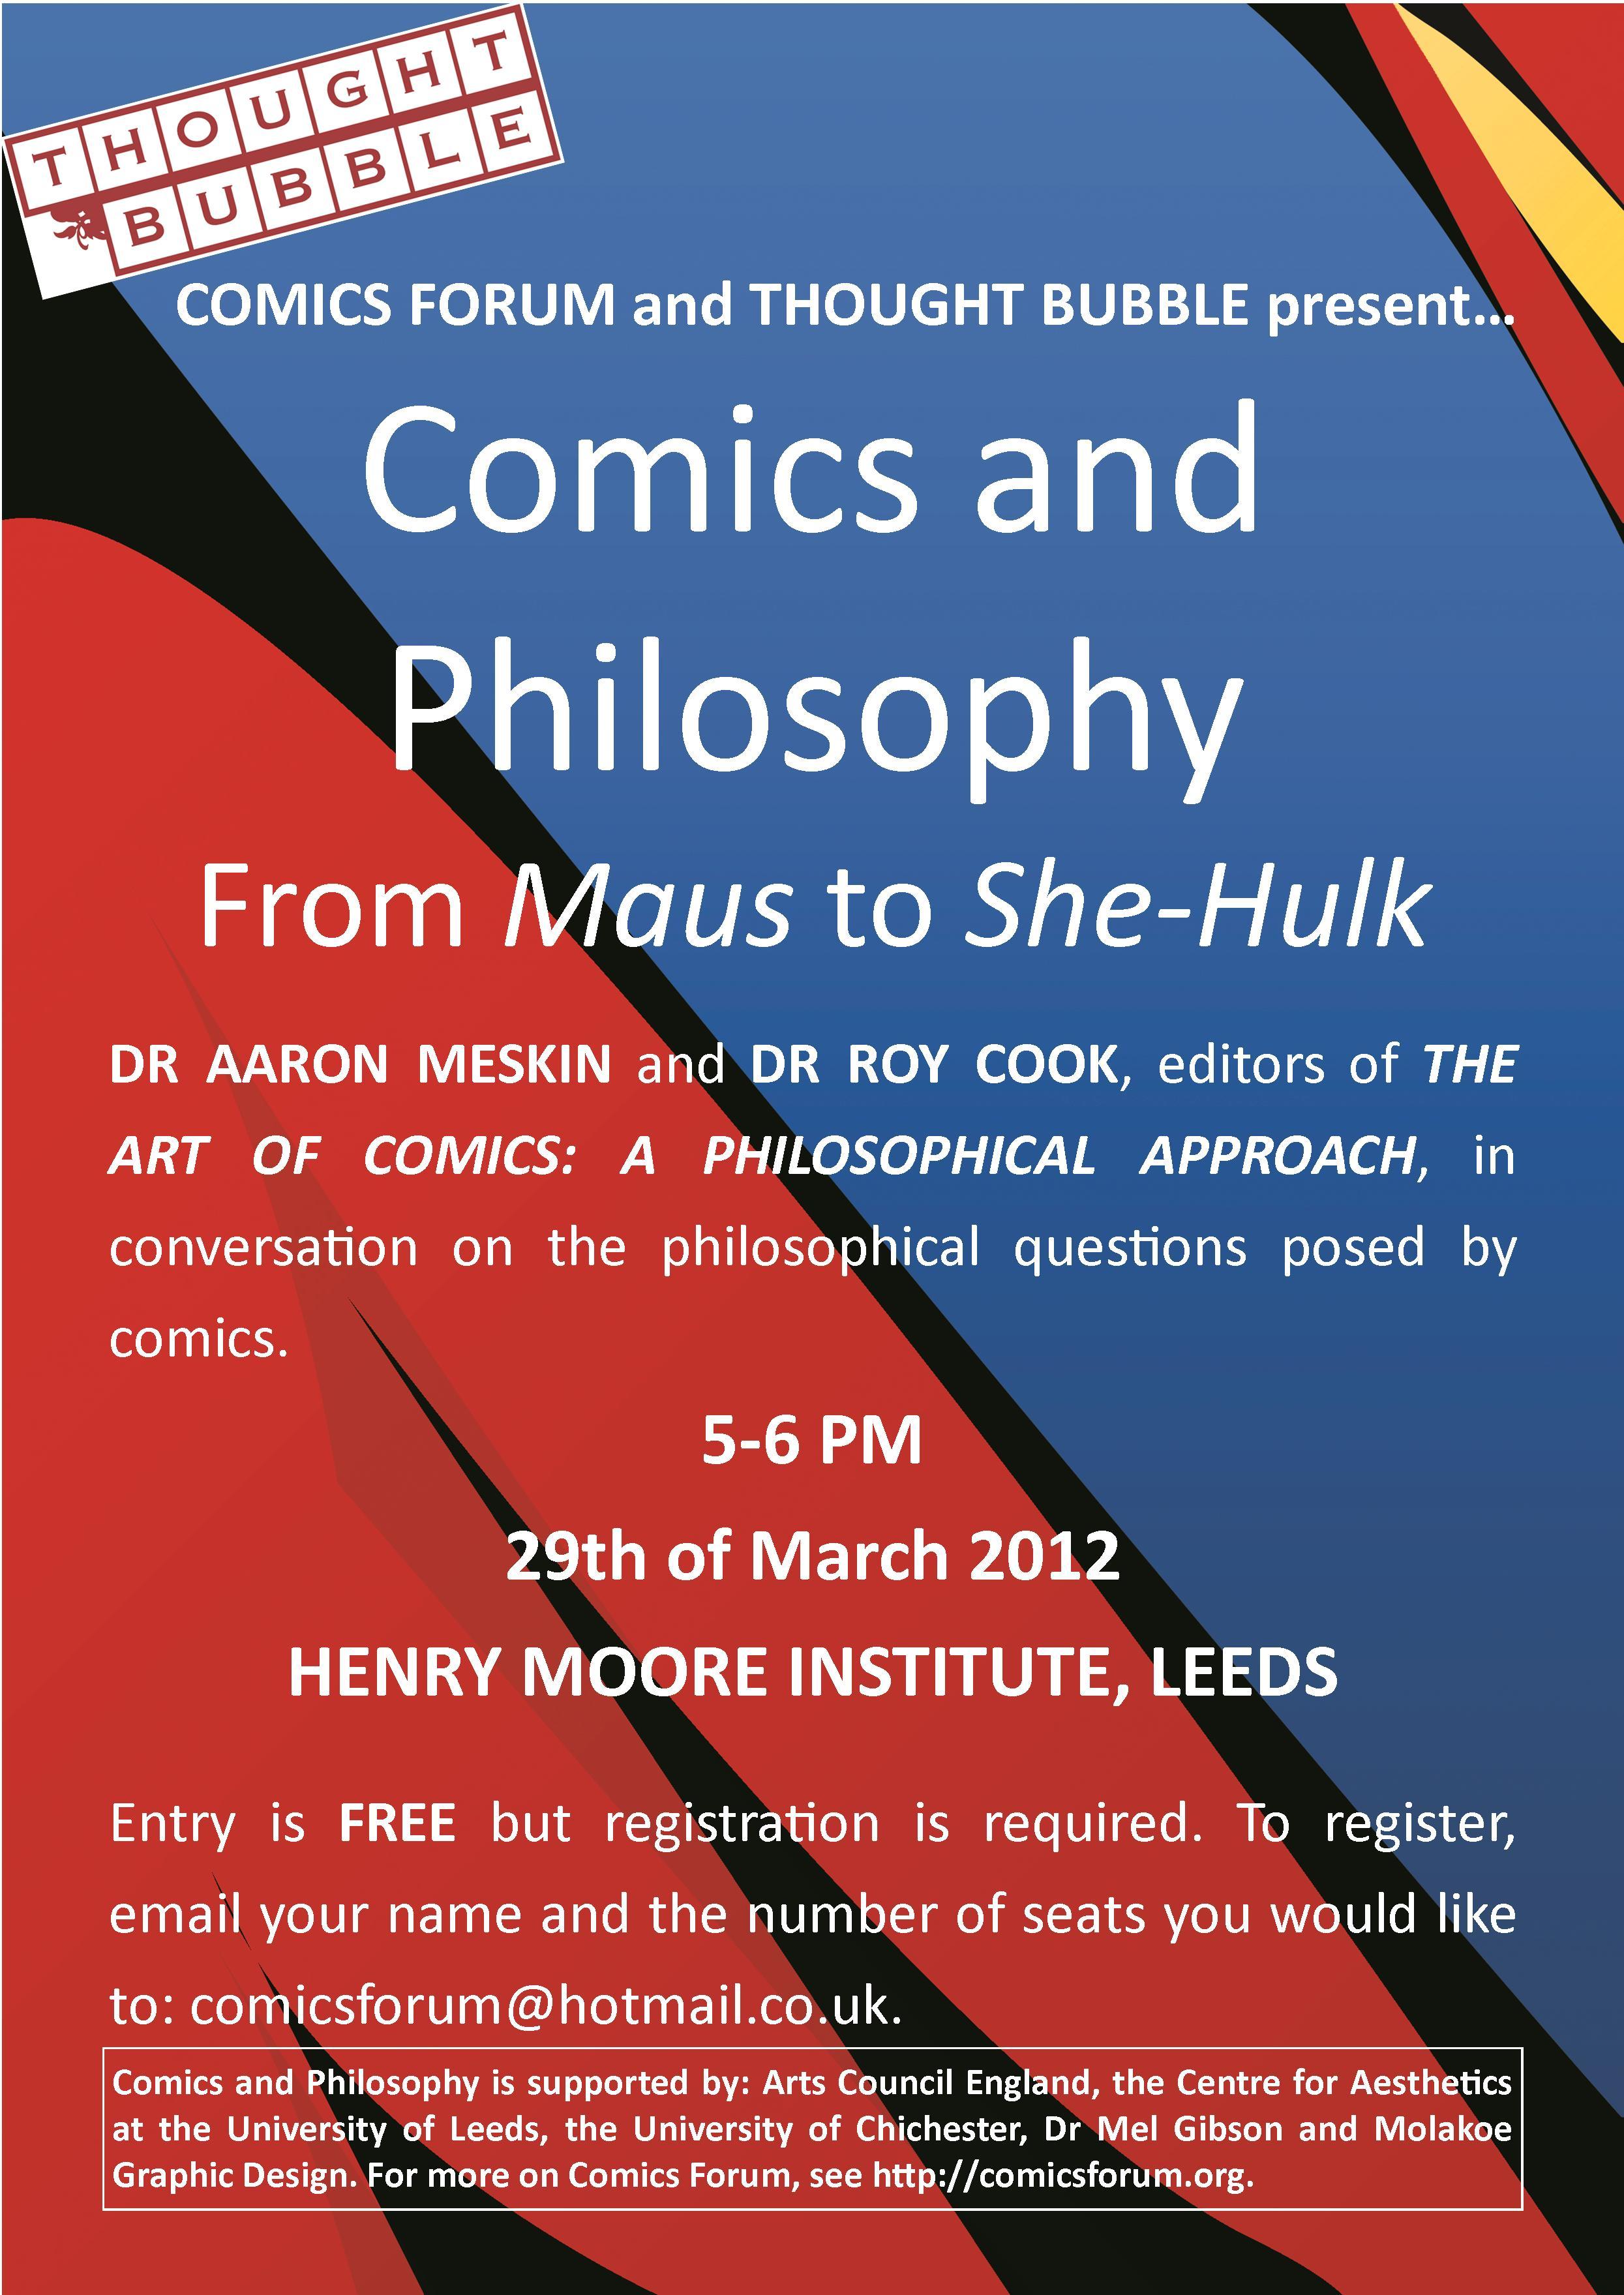 Comics & Philosophy (2012) - Poster [FINAL].jpg